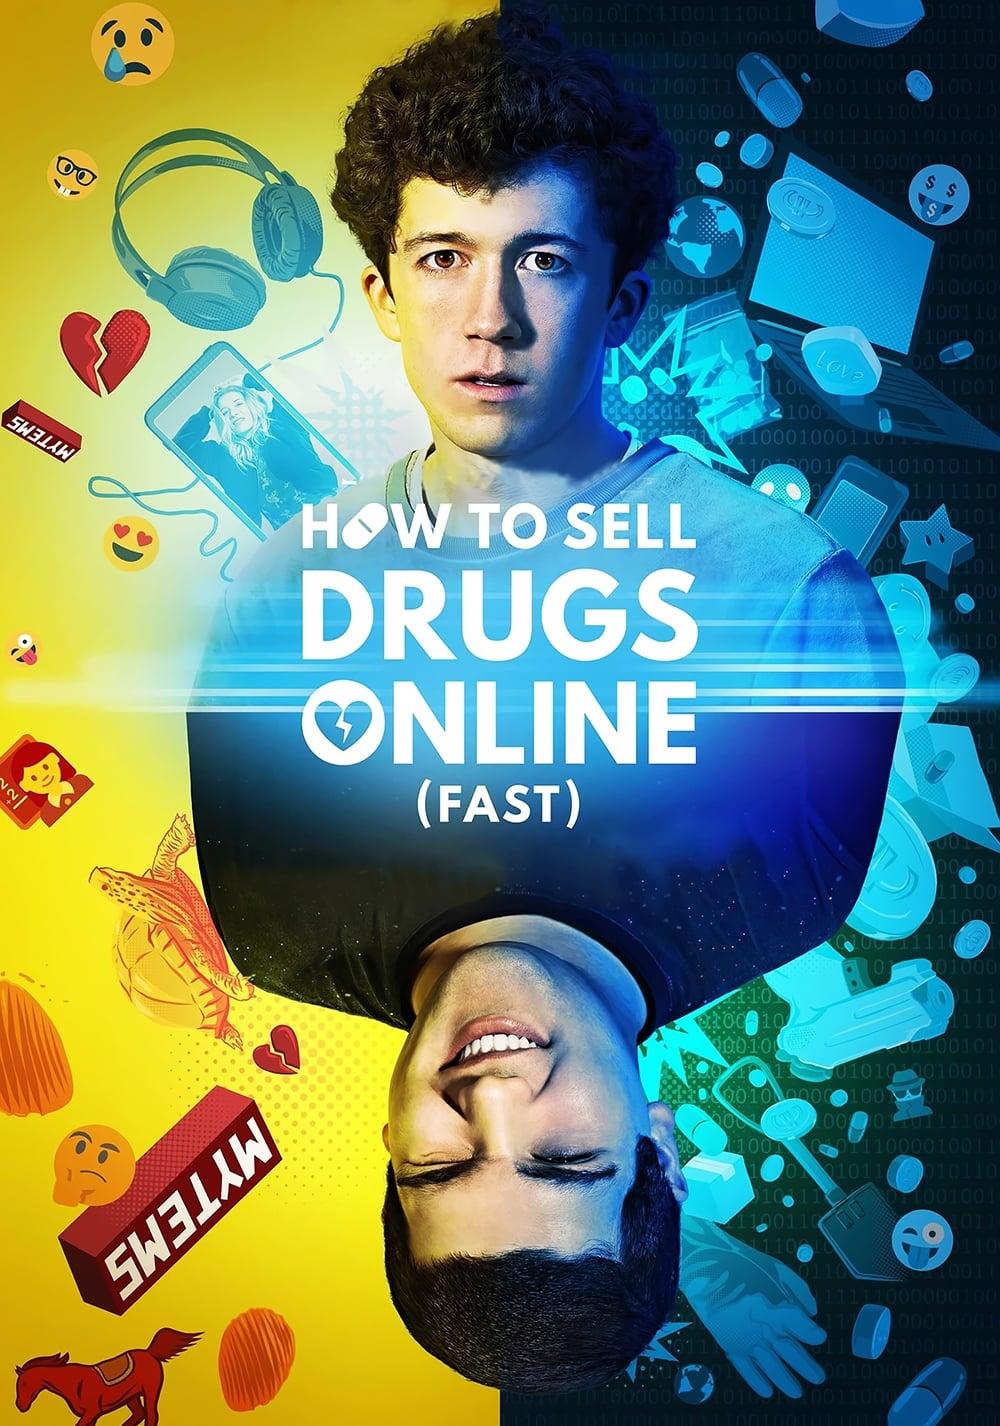 Assistir Como Vender Drogas Online (Rápido)